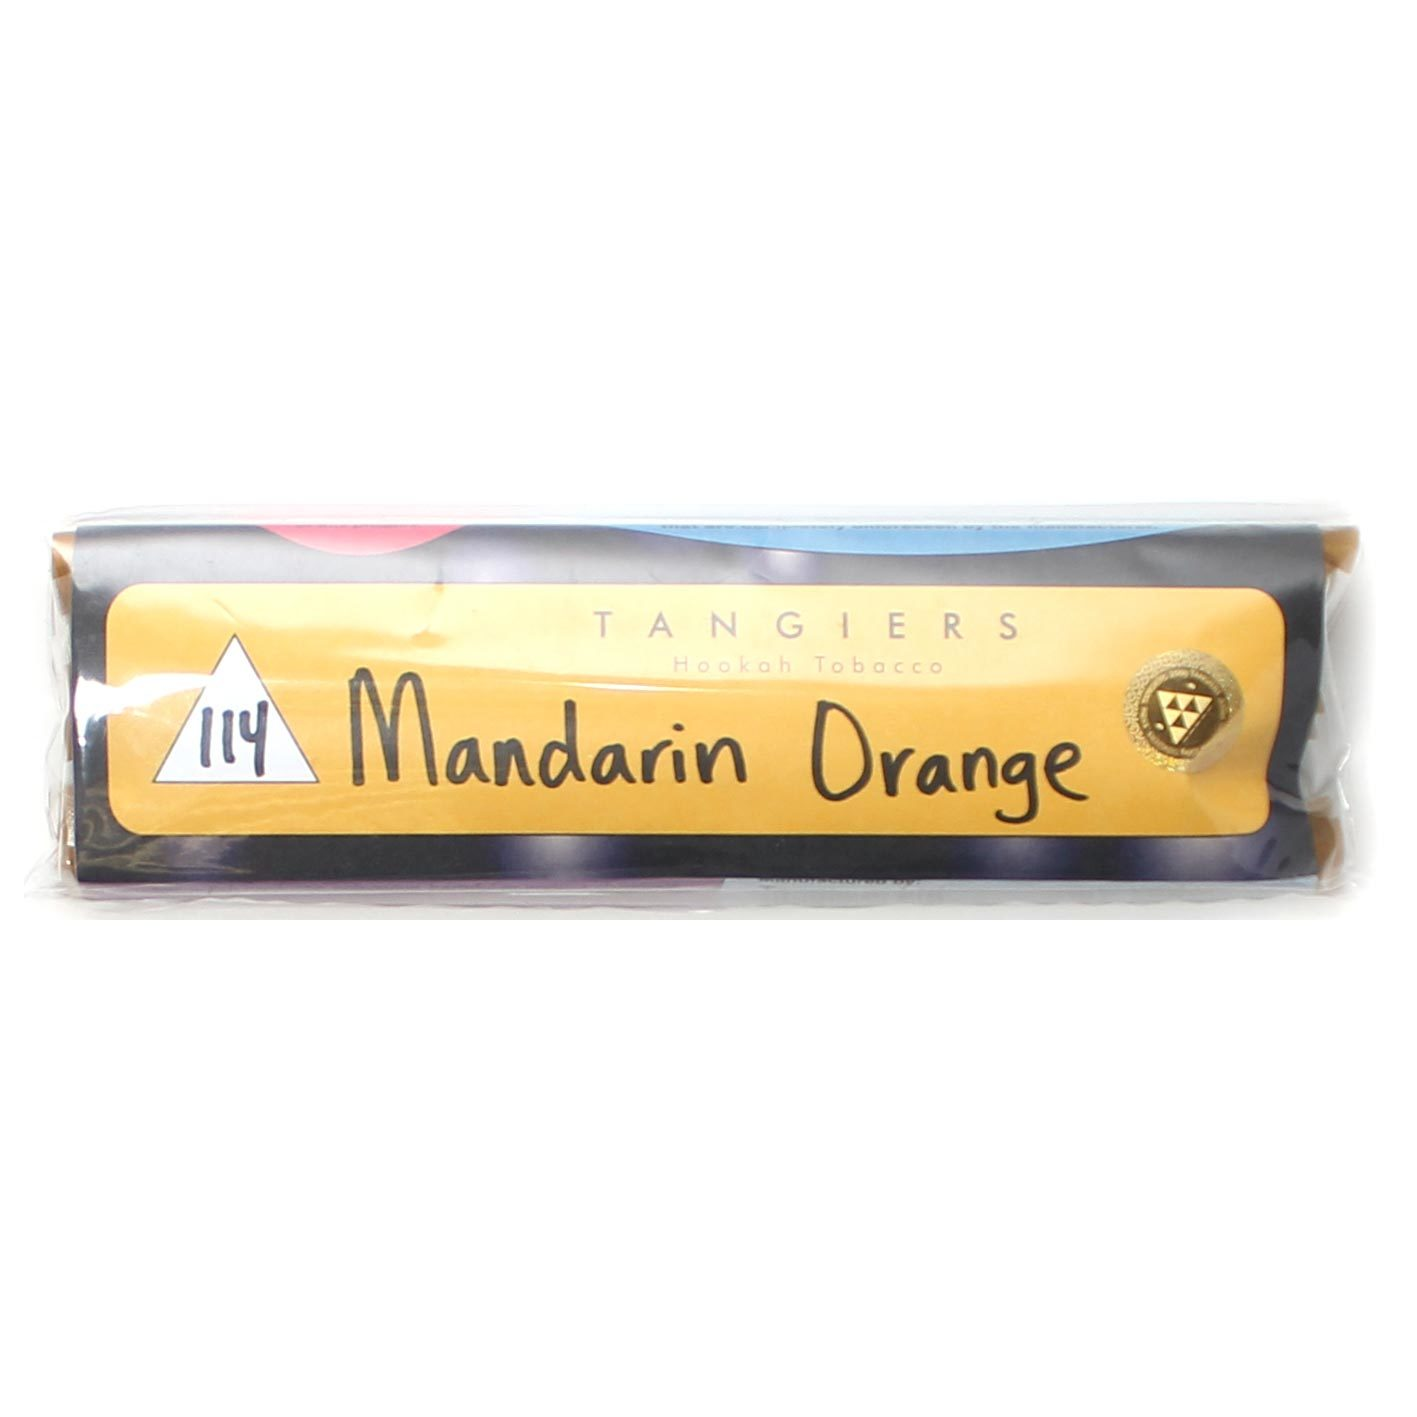 Табак для кальяна Tangiers Noir (желтый) 114 Mandarin Orange